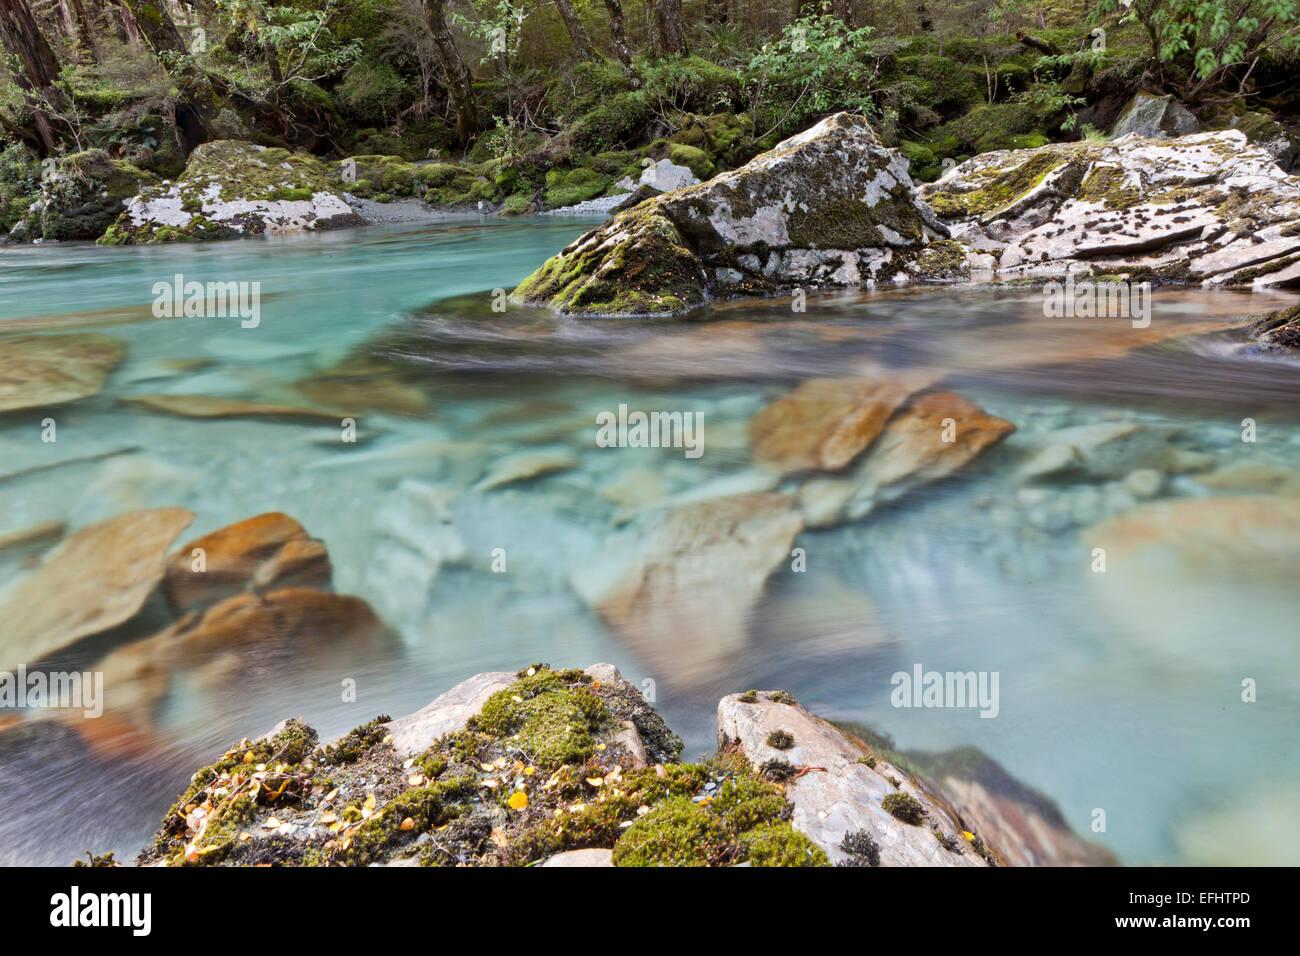 Türkisfarbenes, klares Gebirgswasser entlang der Routeburn Track, ein Great Walk, Südinsel, Neuseeland Stockbild